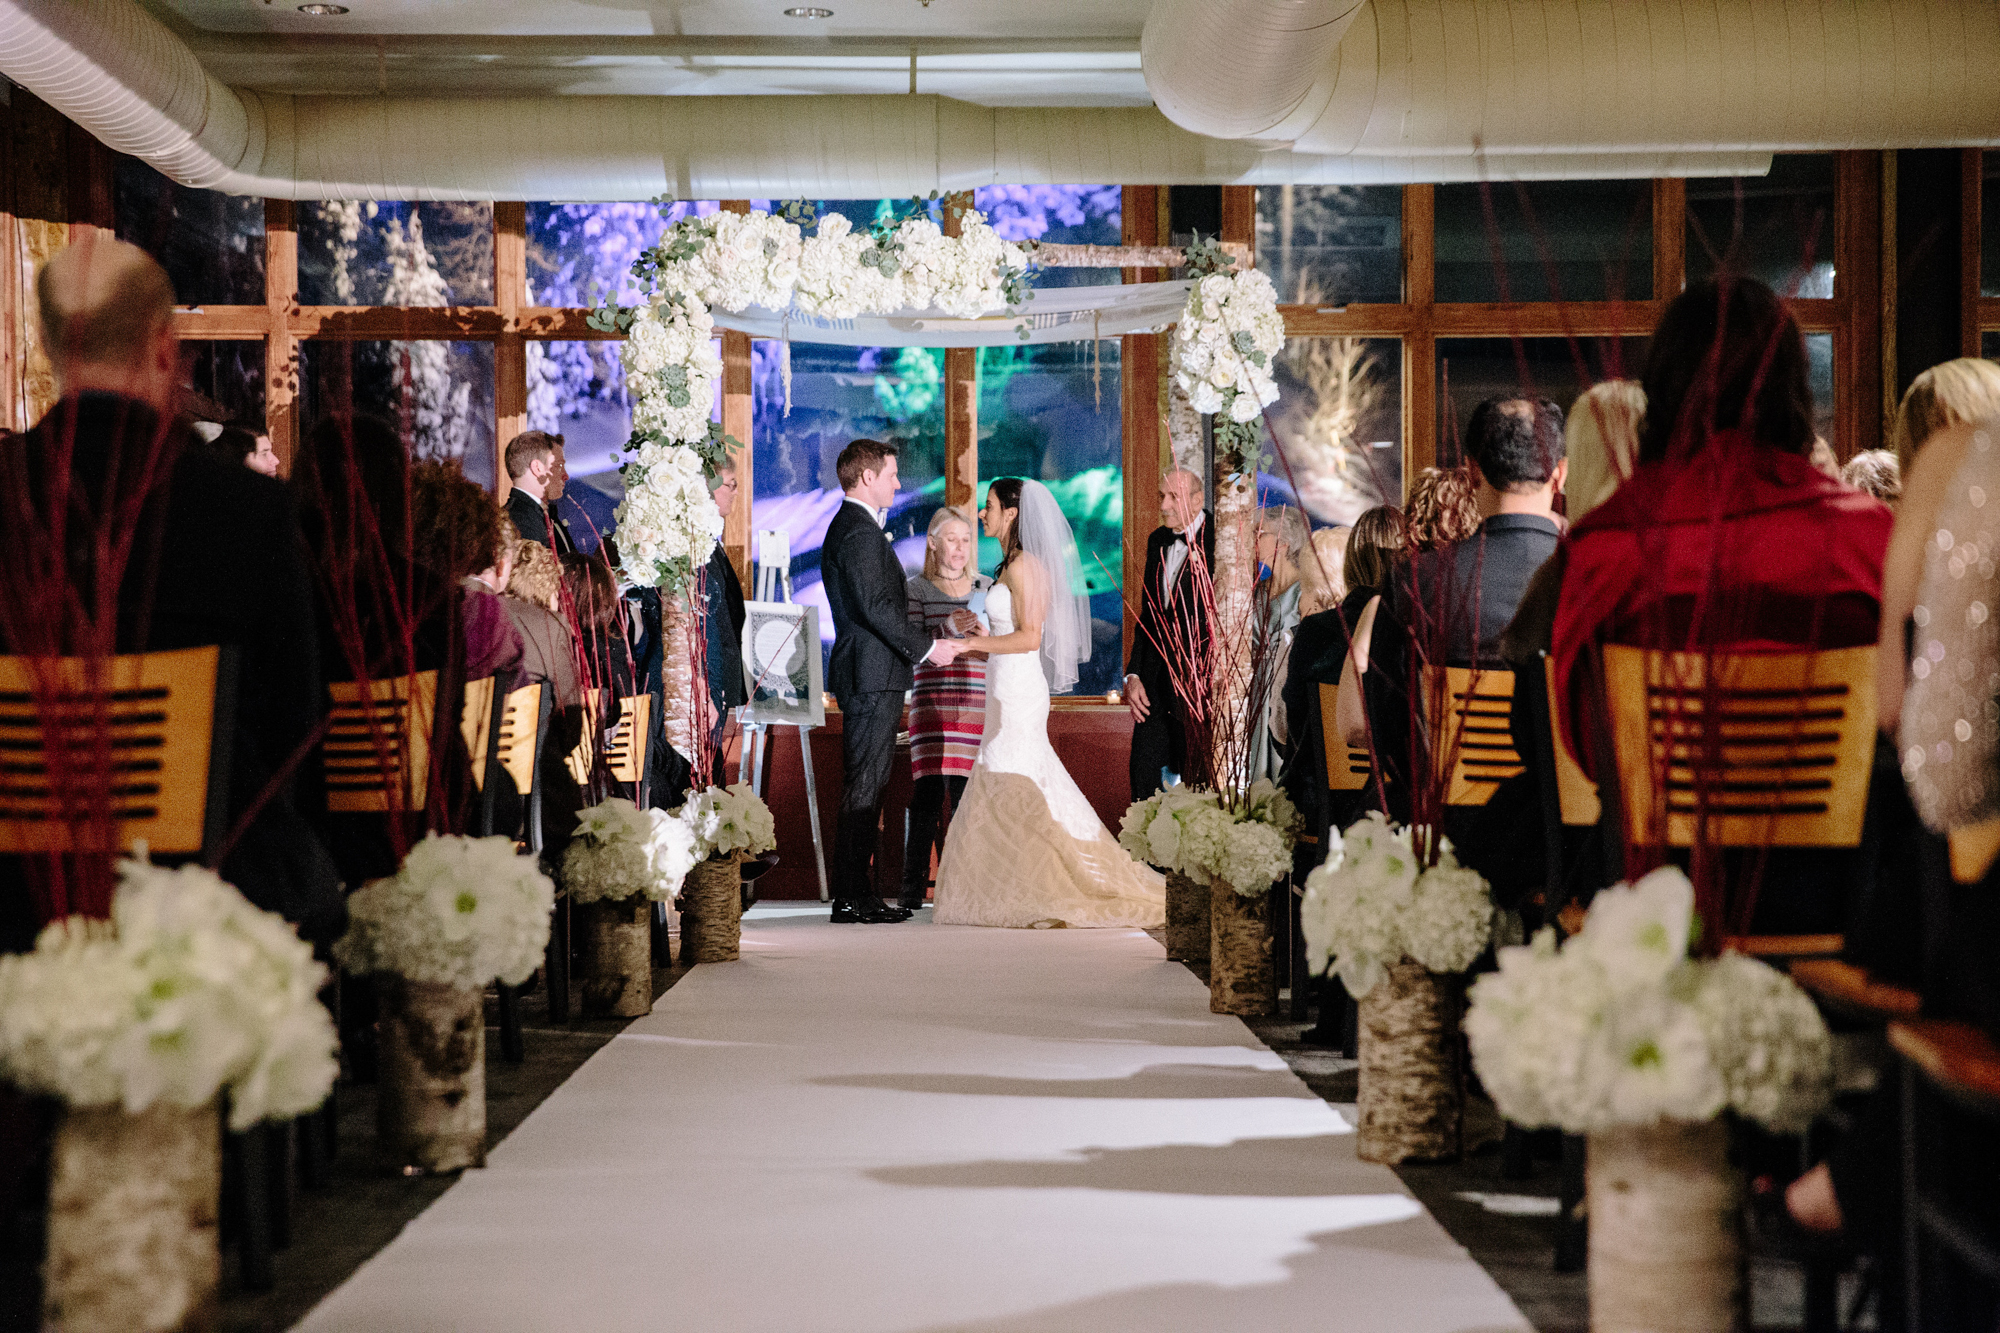 canyons-red-pine-lodge-wedding-22.jpg